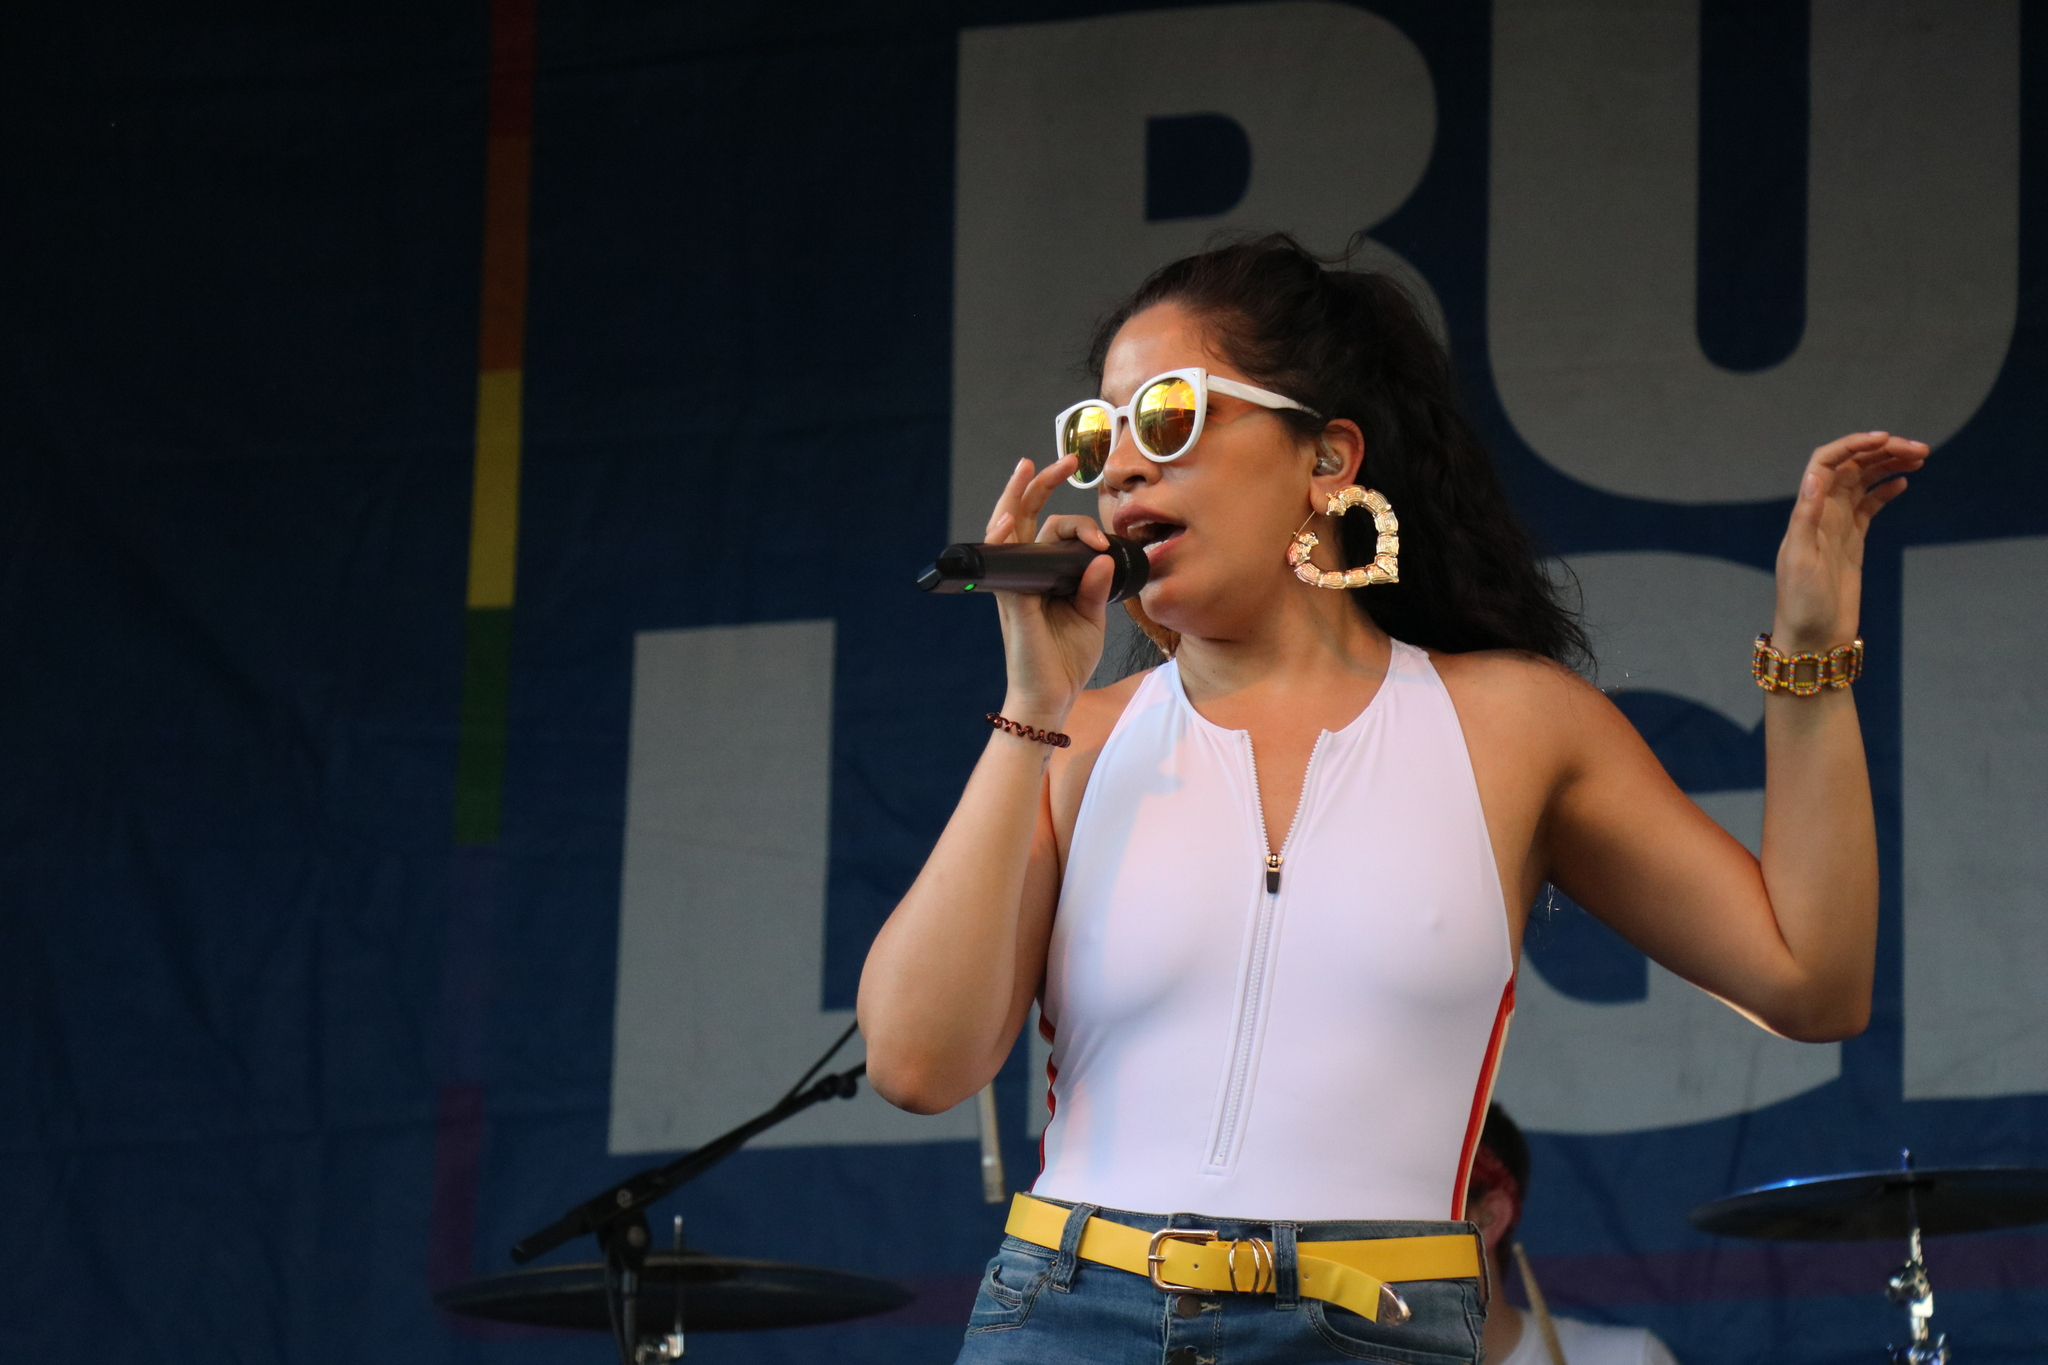 Lead singer Elianne Nascimento. Photo by Hector Cervantes, 14 East.